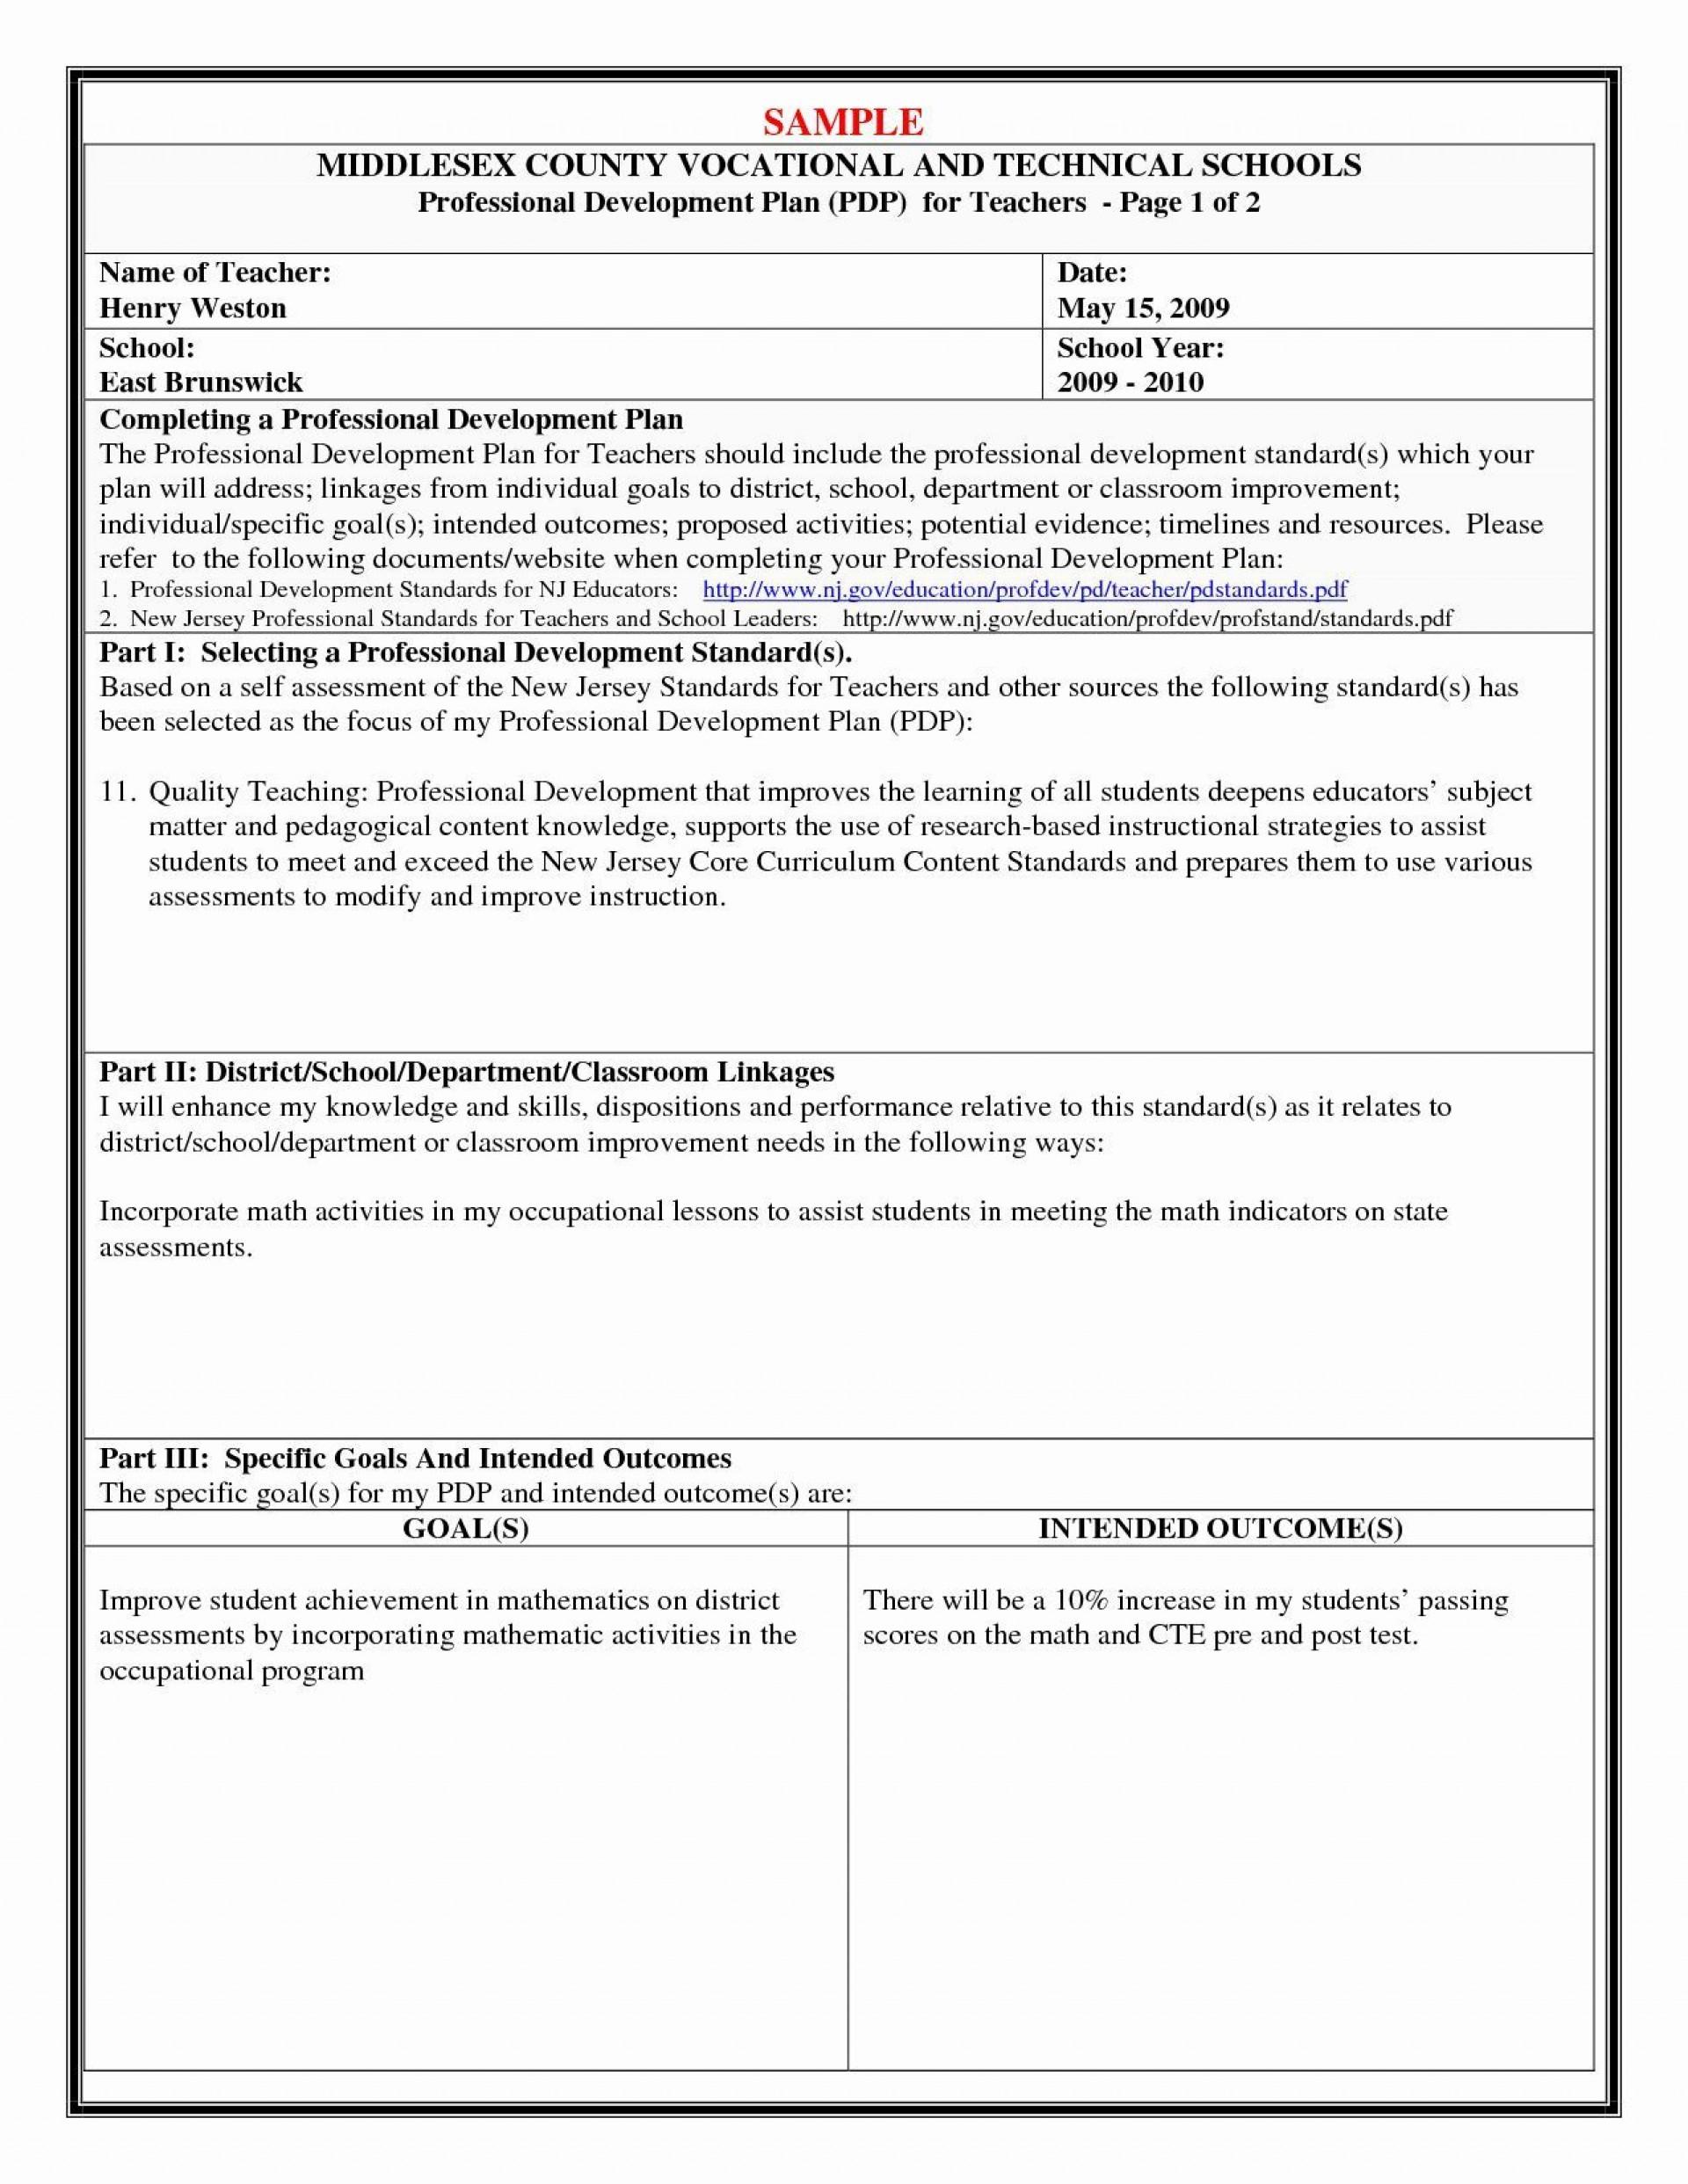 000 Striking Personal Development Plan Example Professional Doc High Definition 1920